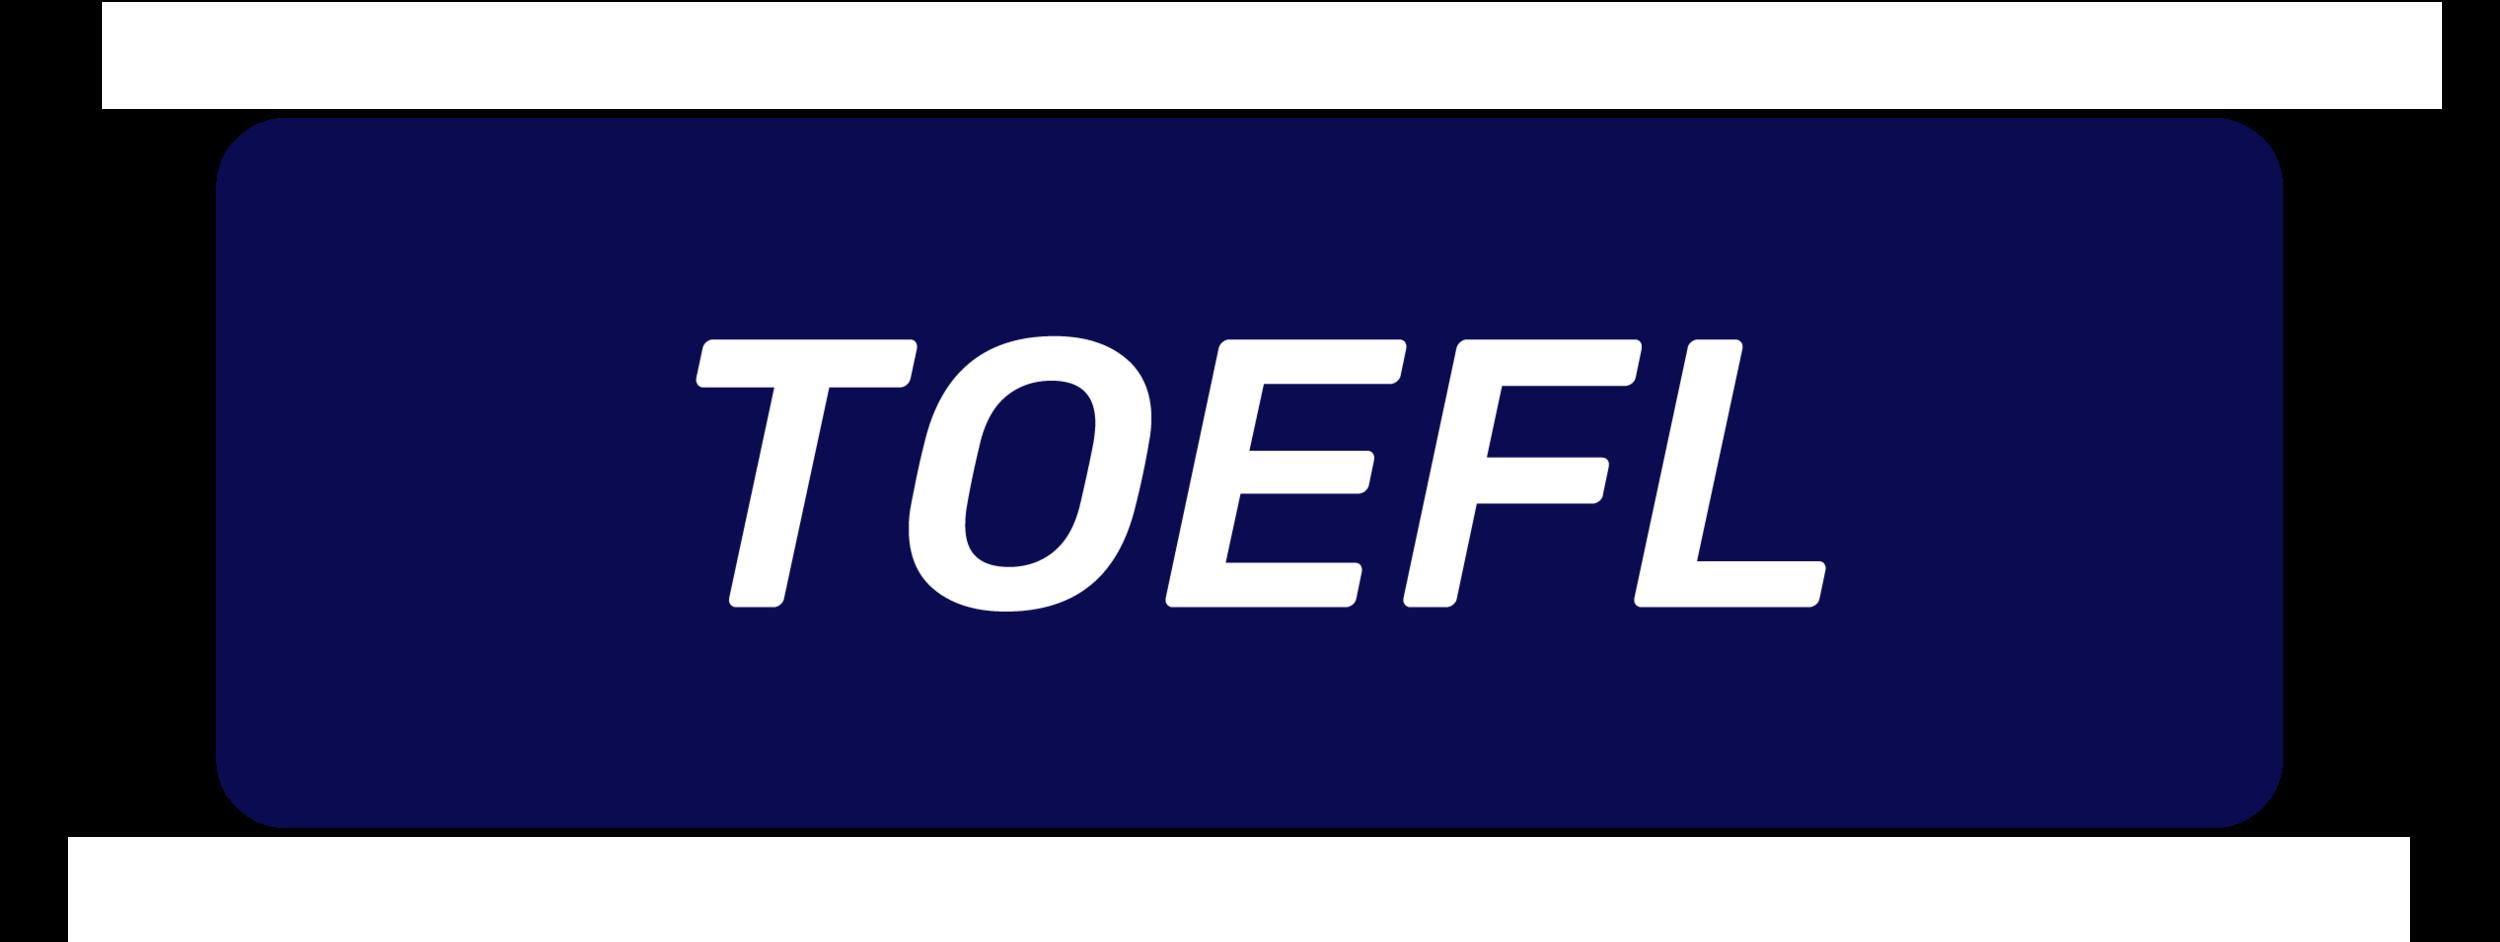 TOEFL-01.png